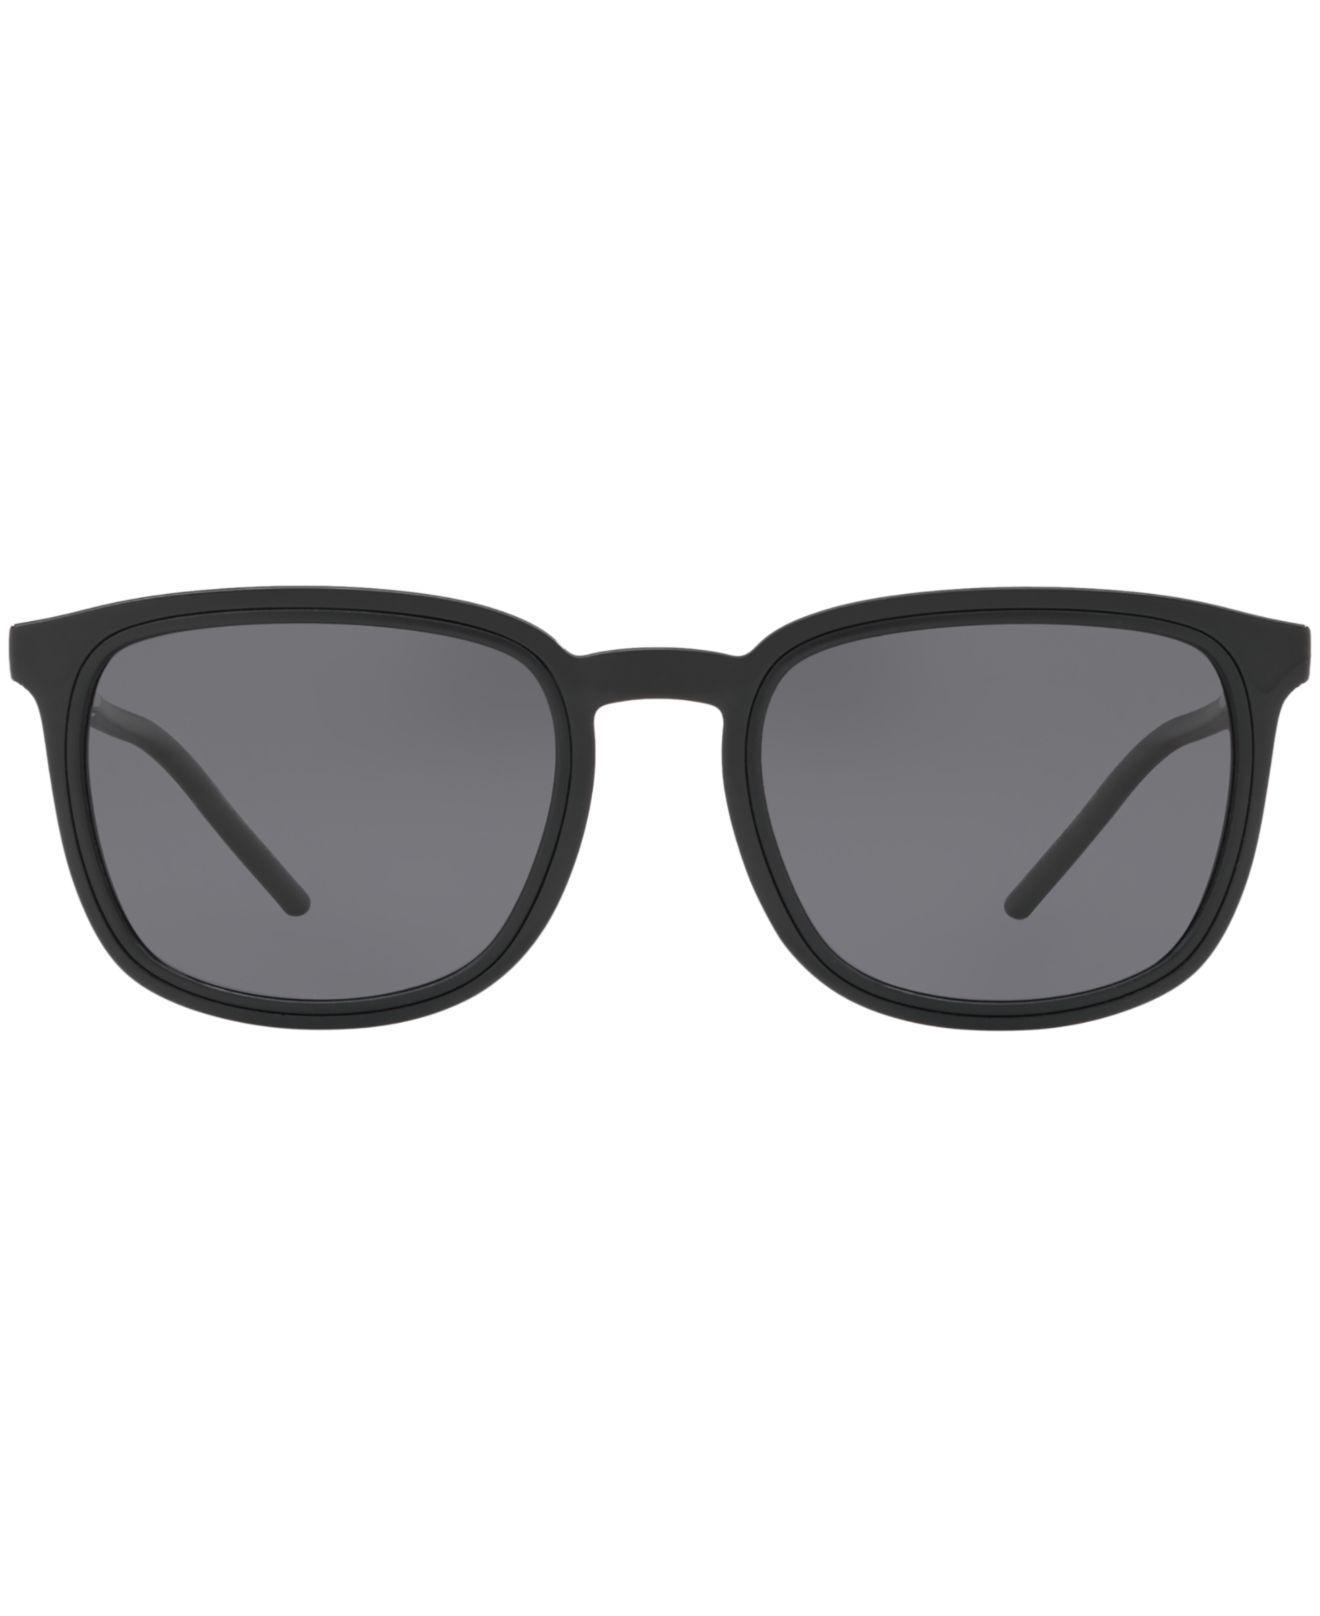 65cb2f4daf8 Lyst - Dolce   Gabbana Sunglasses